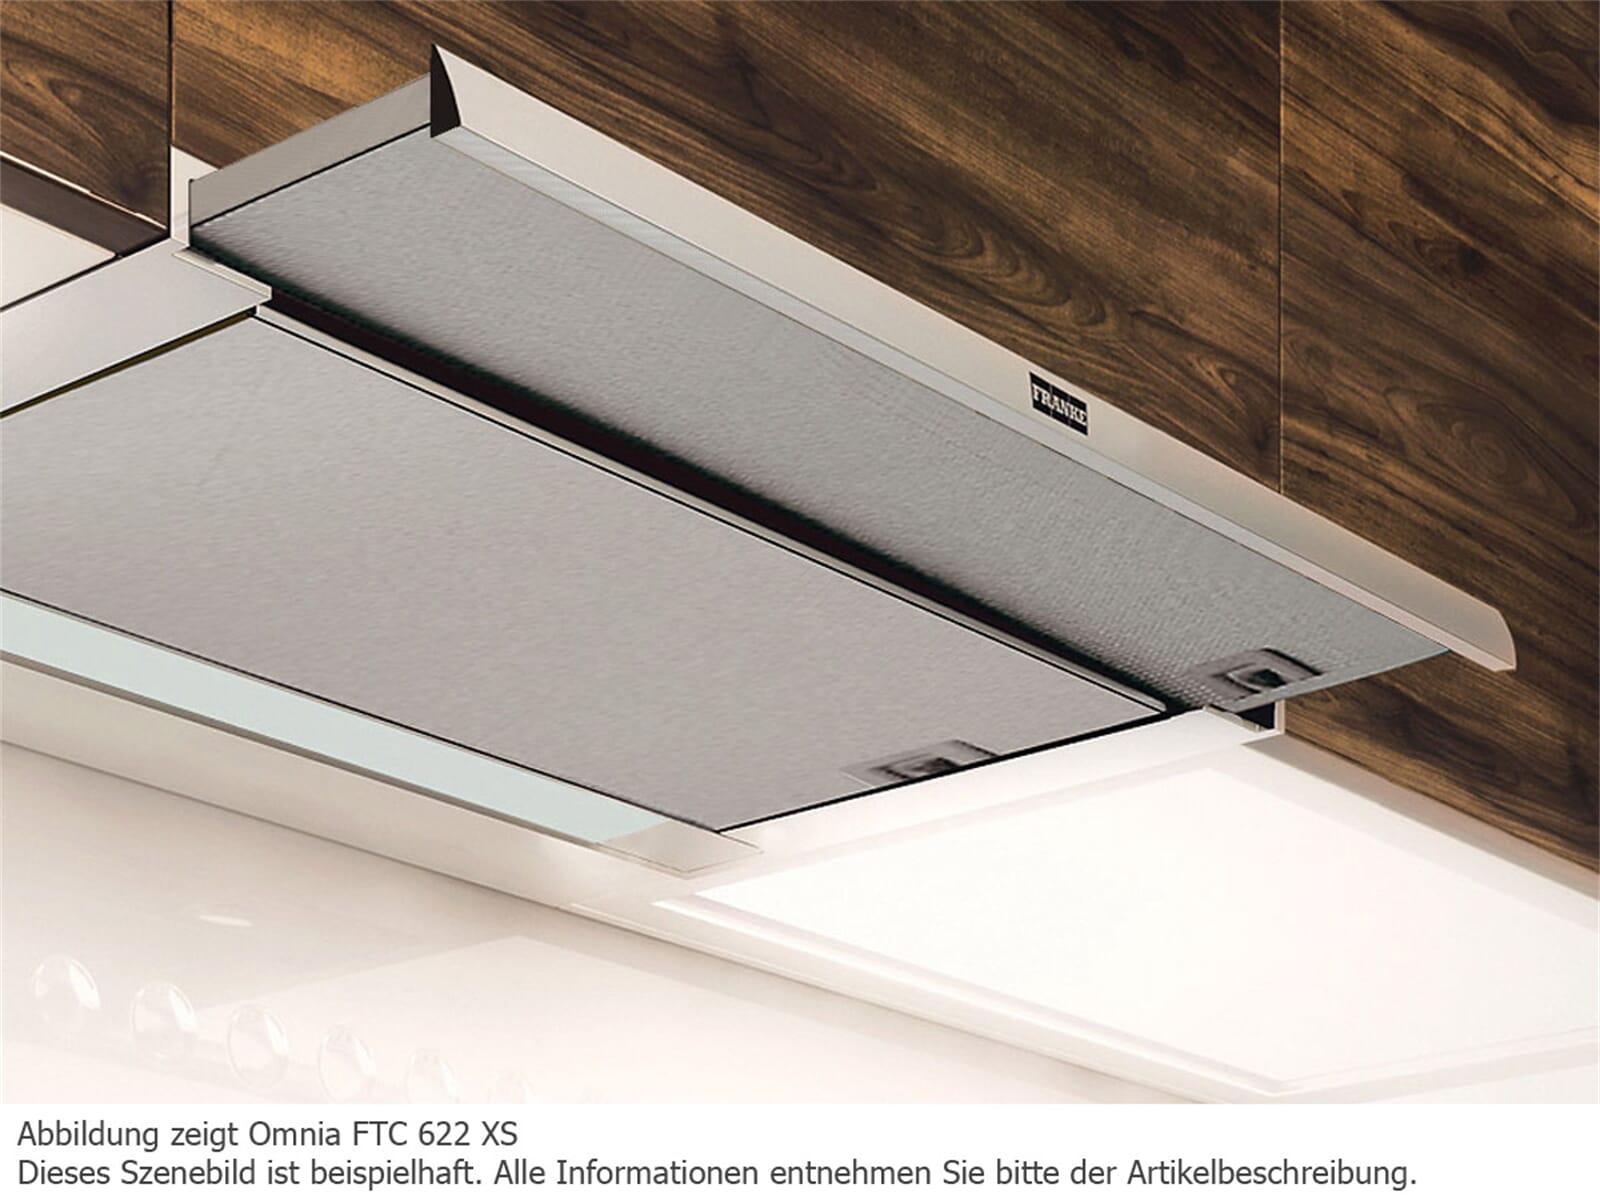 franke omnia ftc 622 xs flachschirmhaube edelstahl. Black Bedroom Furniture Sets. Home Design Ideas